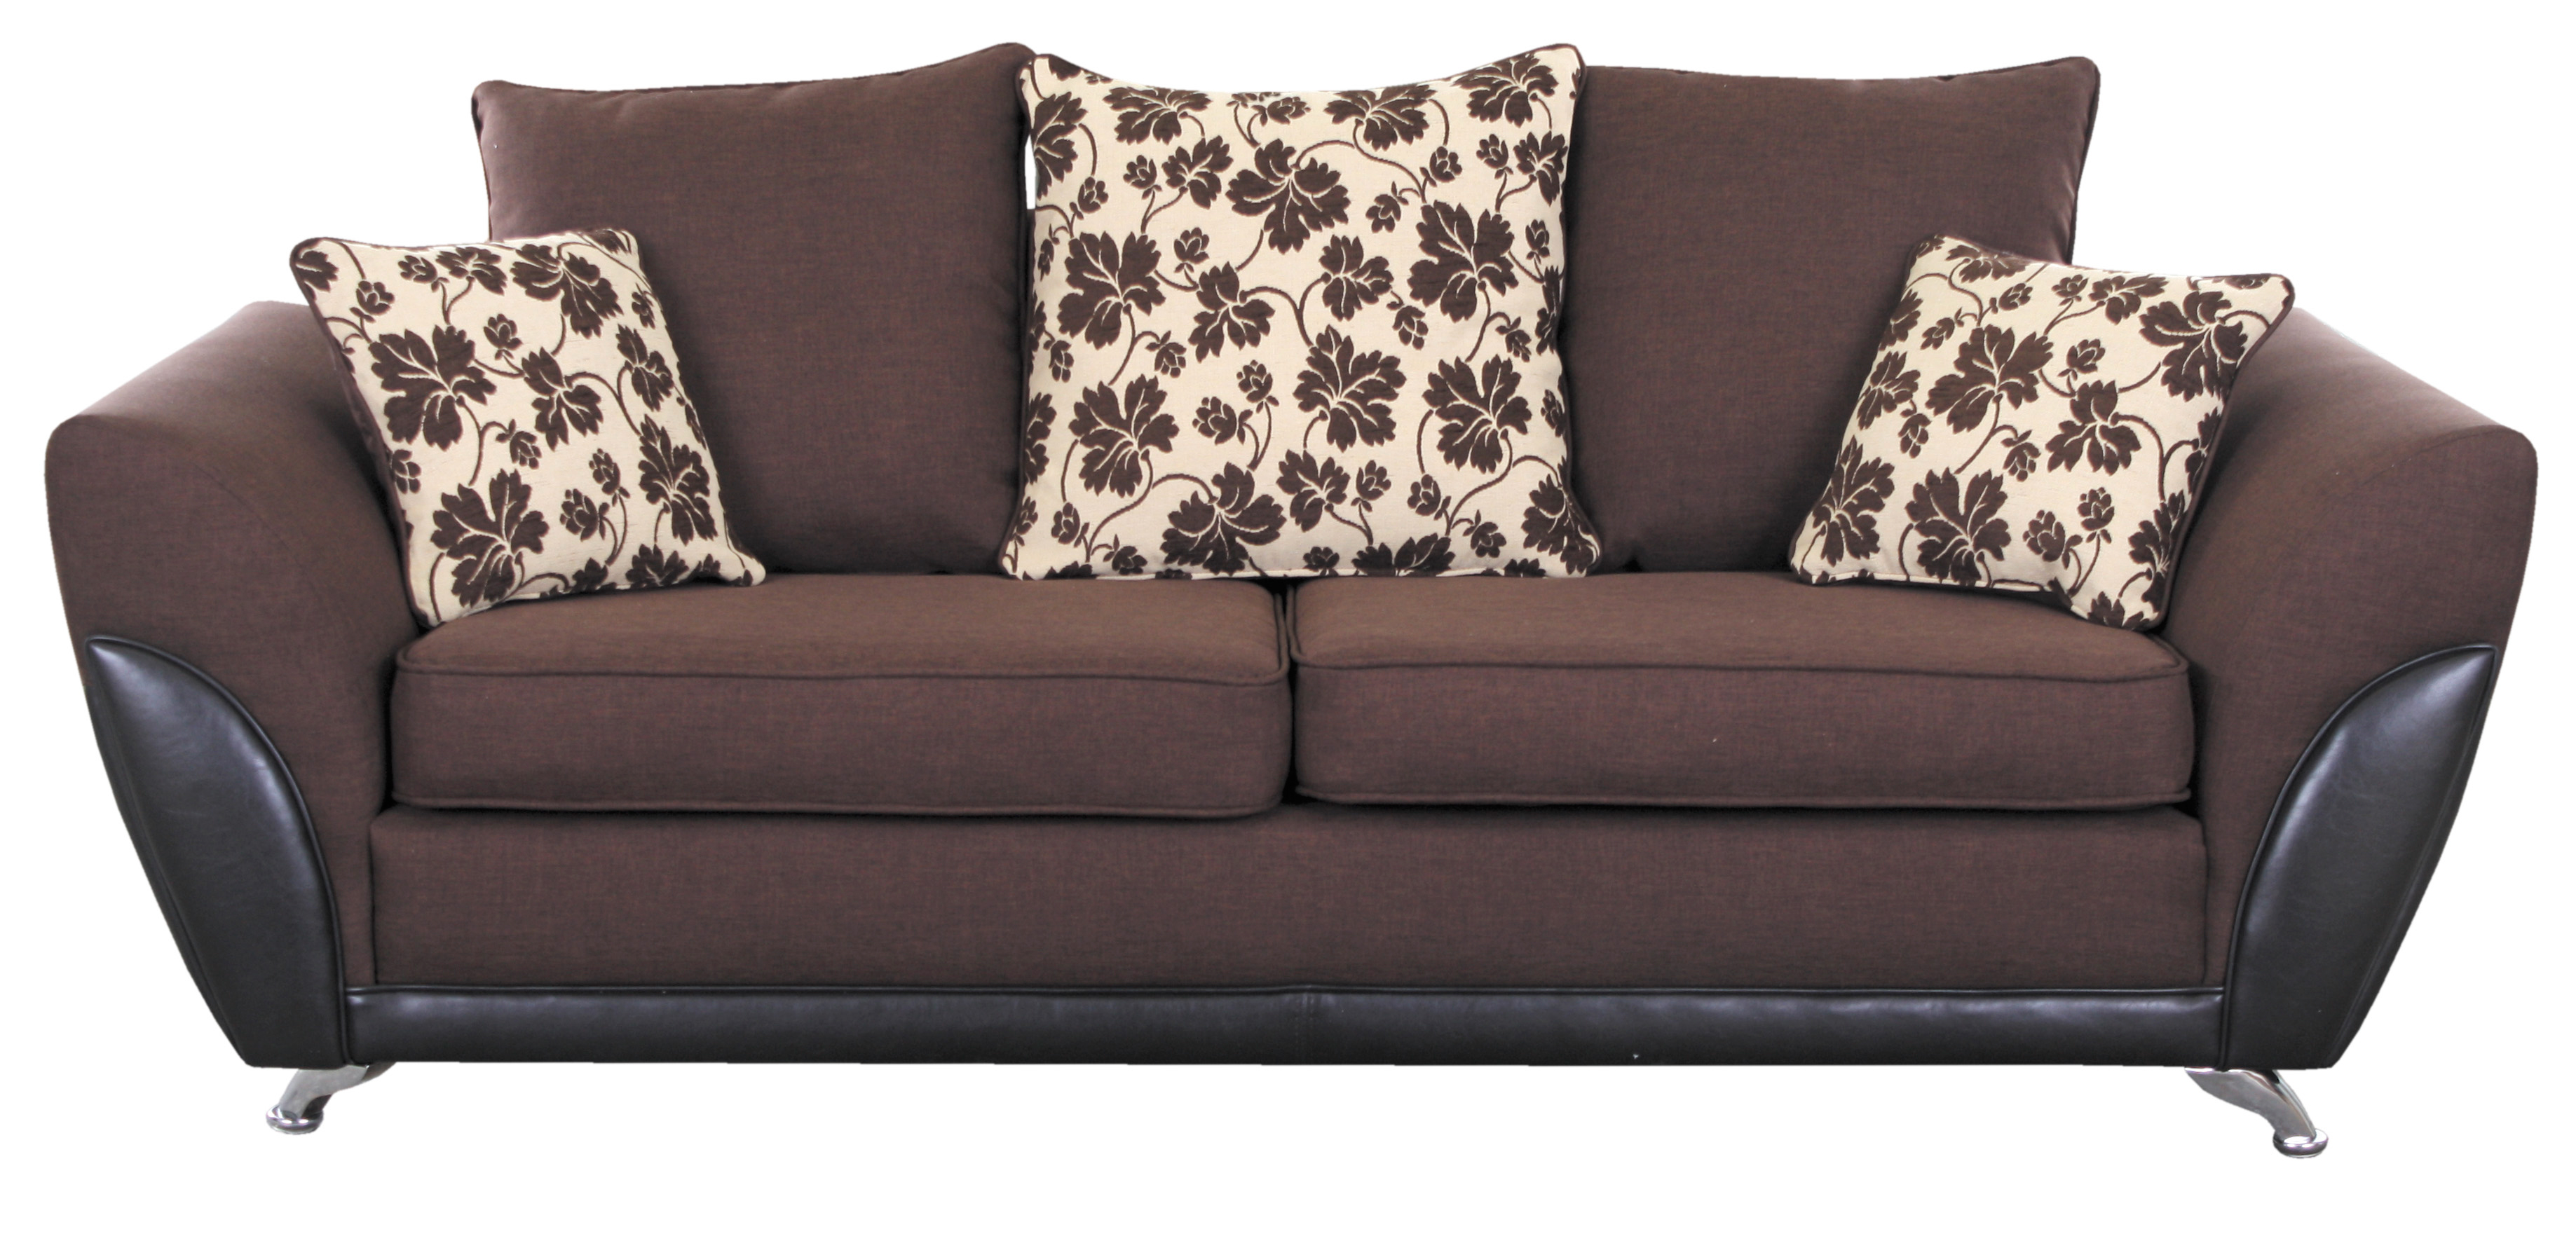 Ebba 3 sits soffa Valfritt tyg 4195 kr Trendrum se